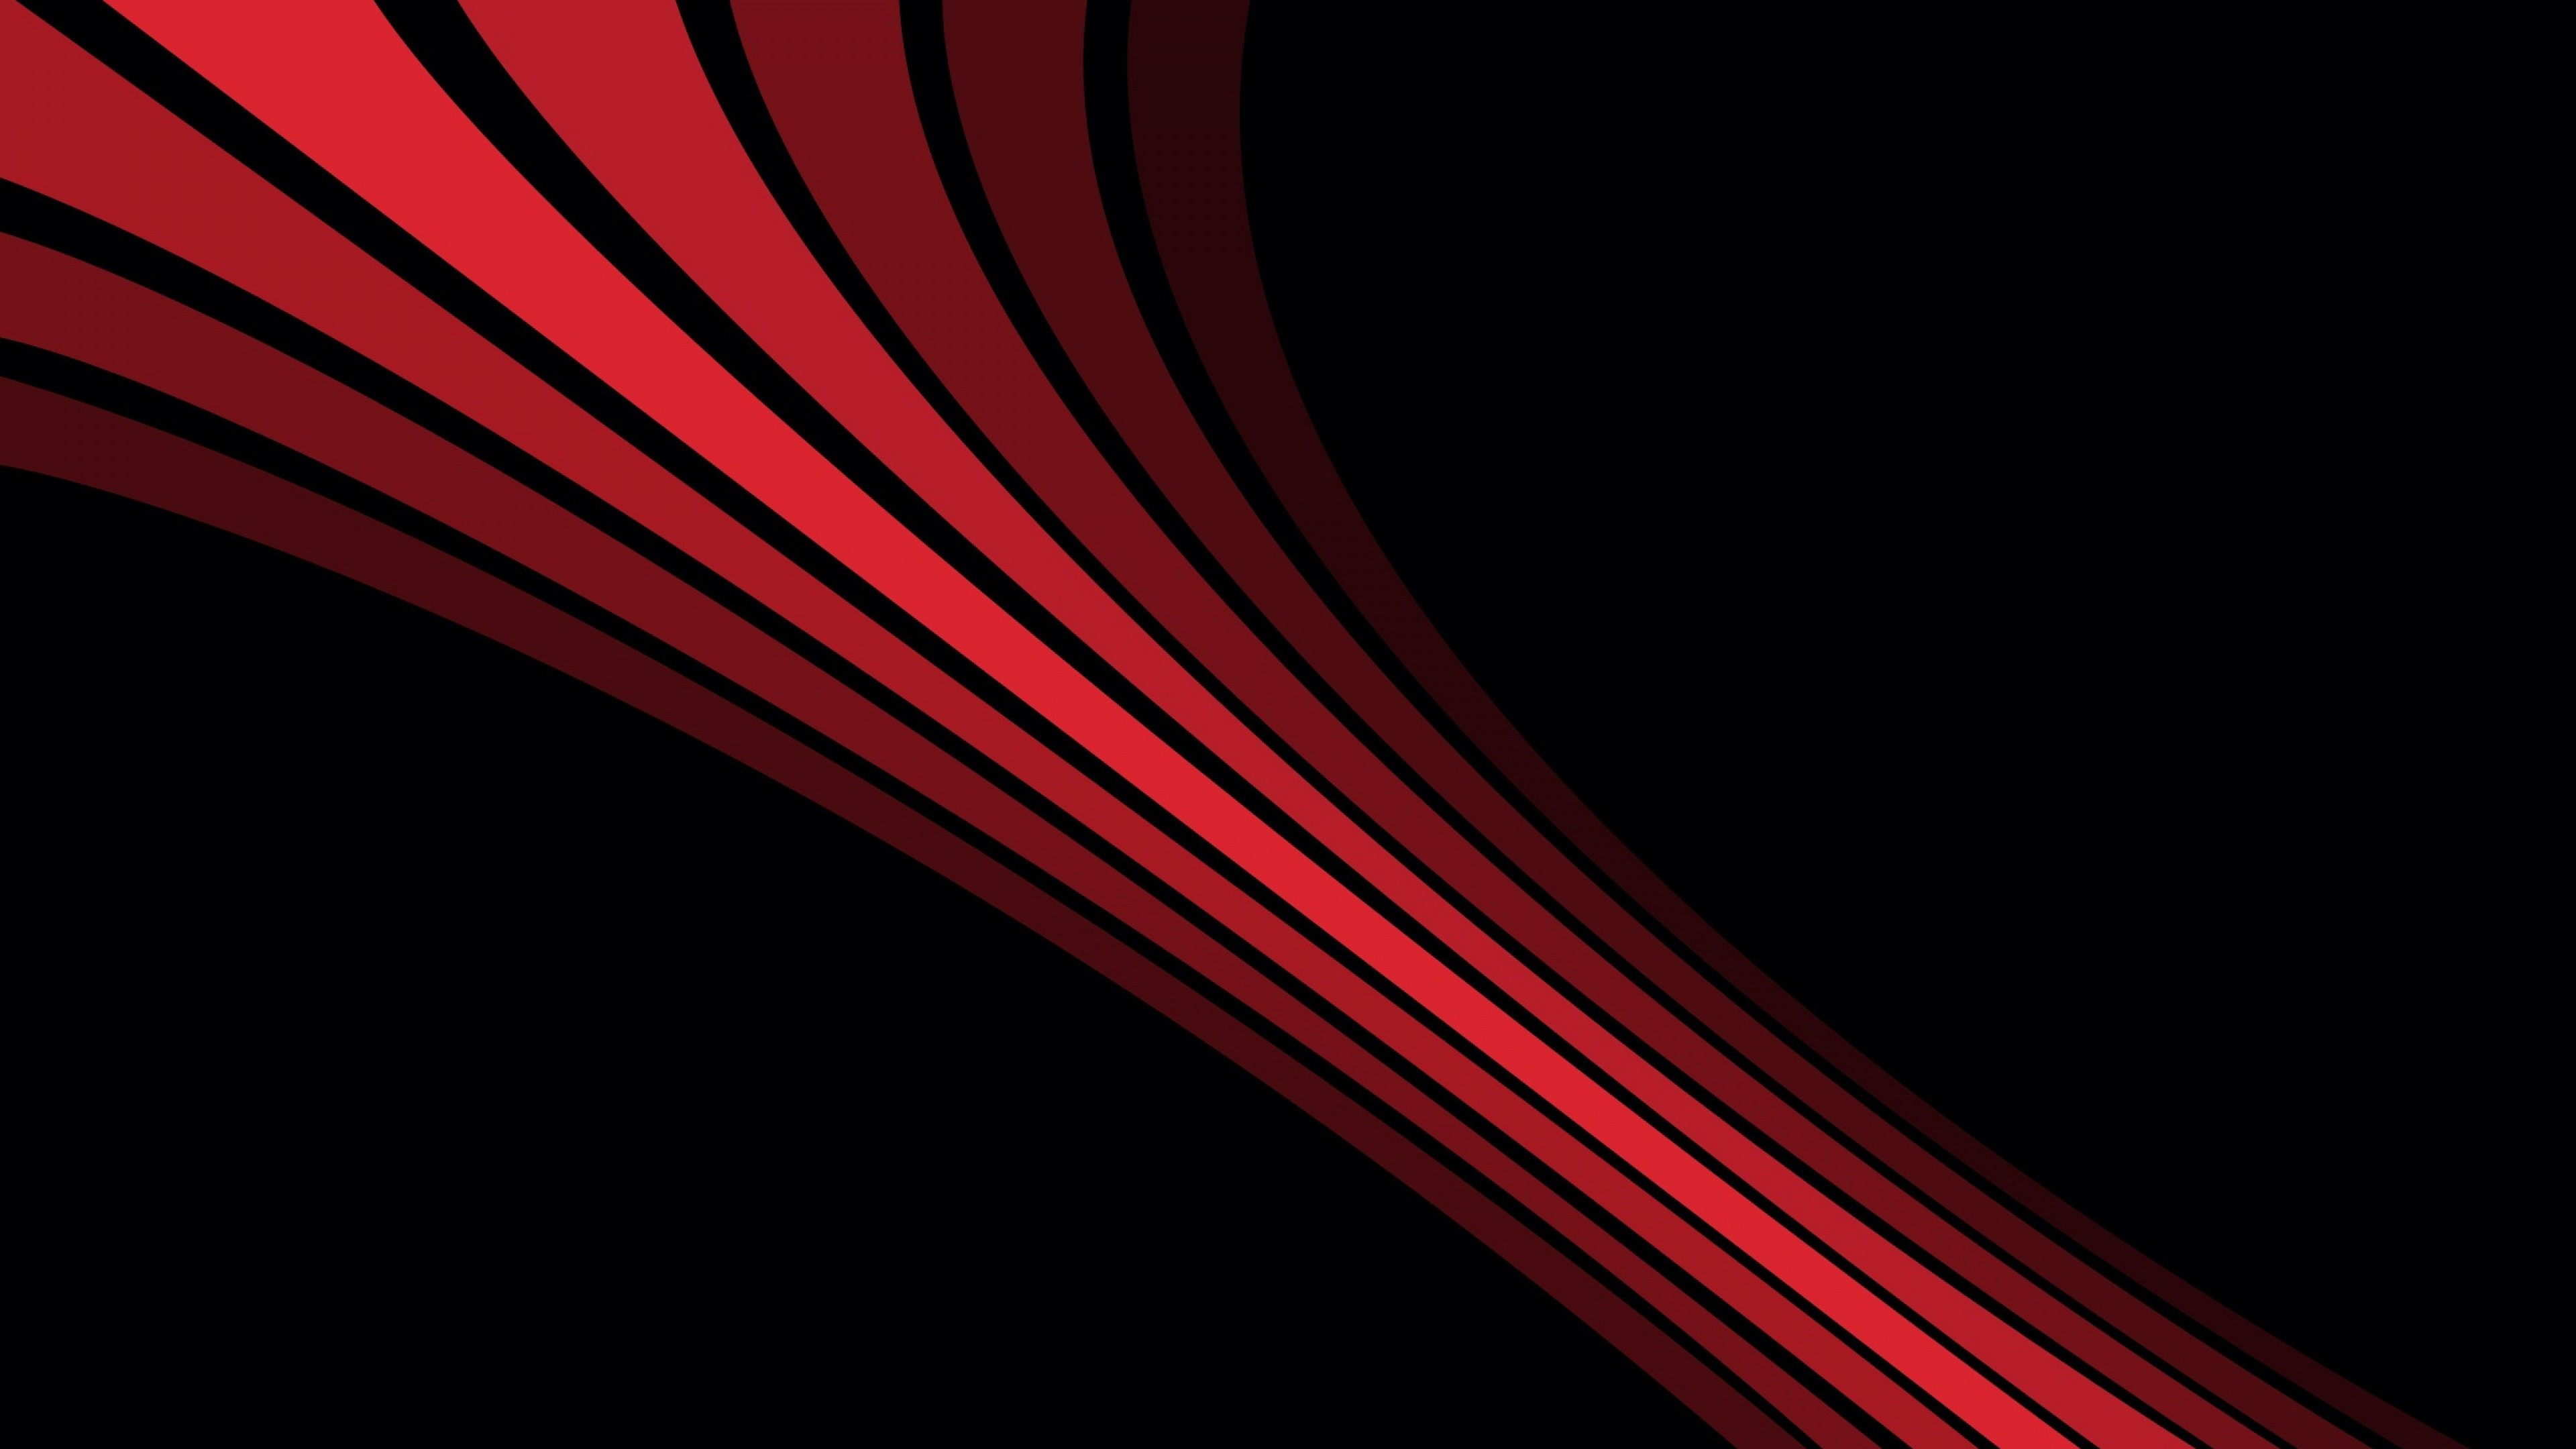 Shadow, Stripes, Shape, Black, Red Wallpaper, Background 4K .